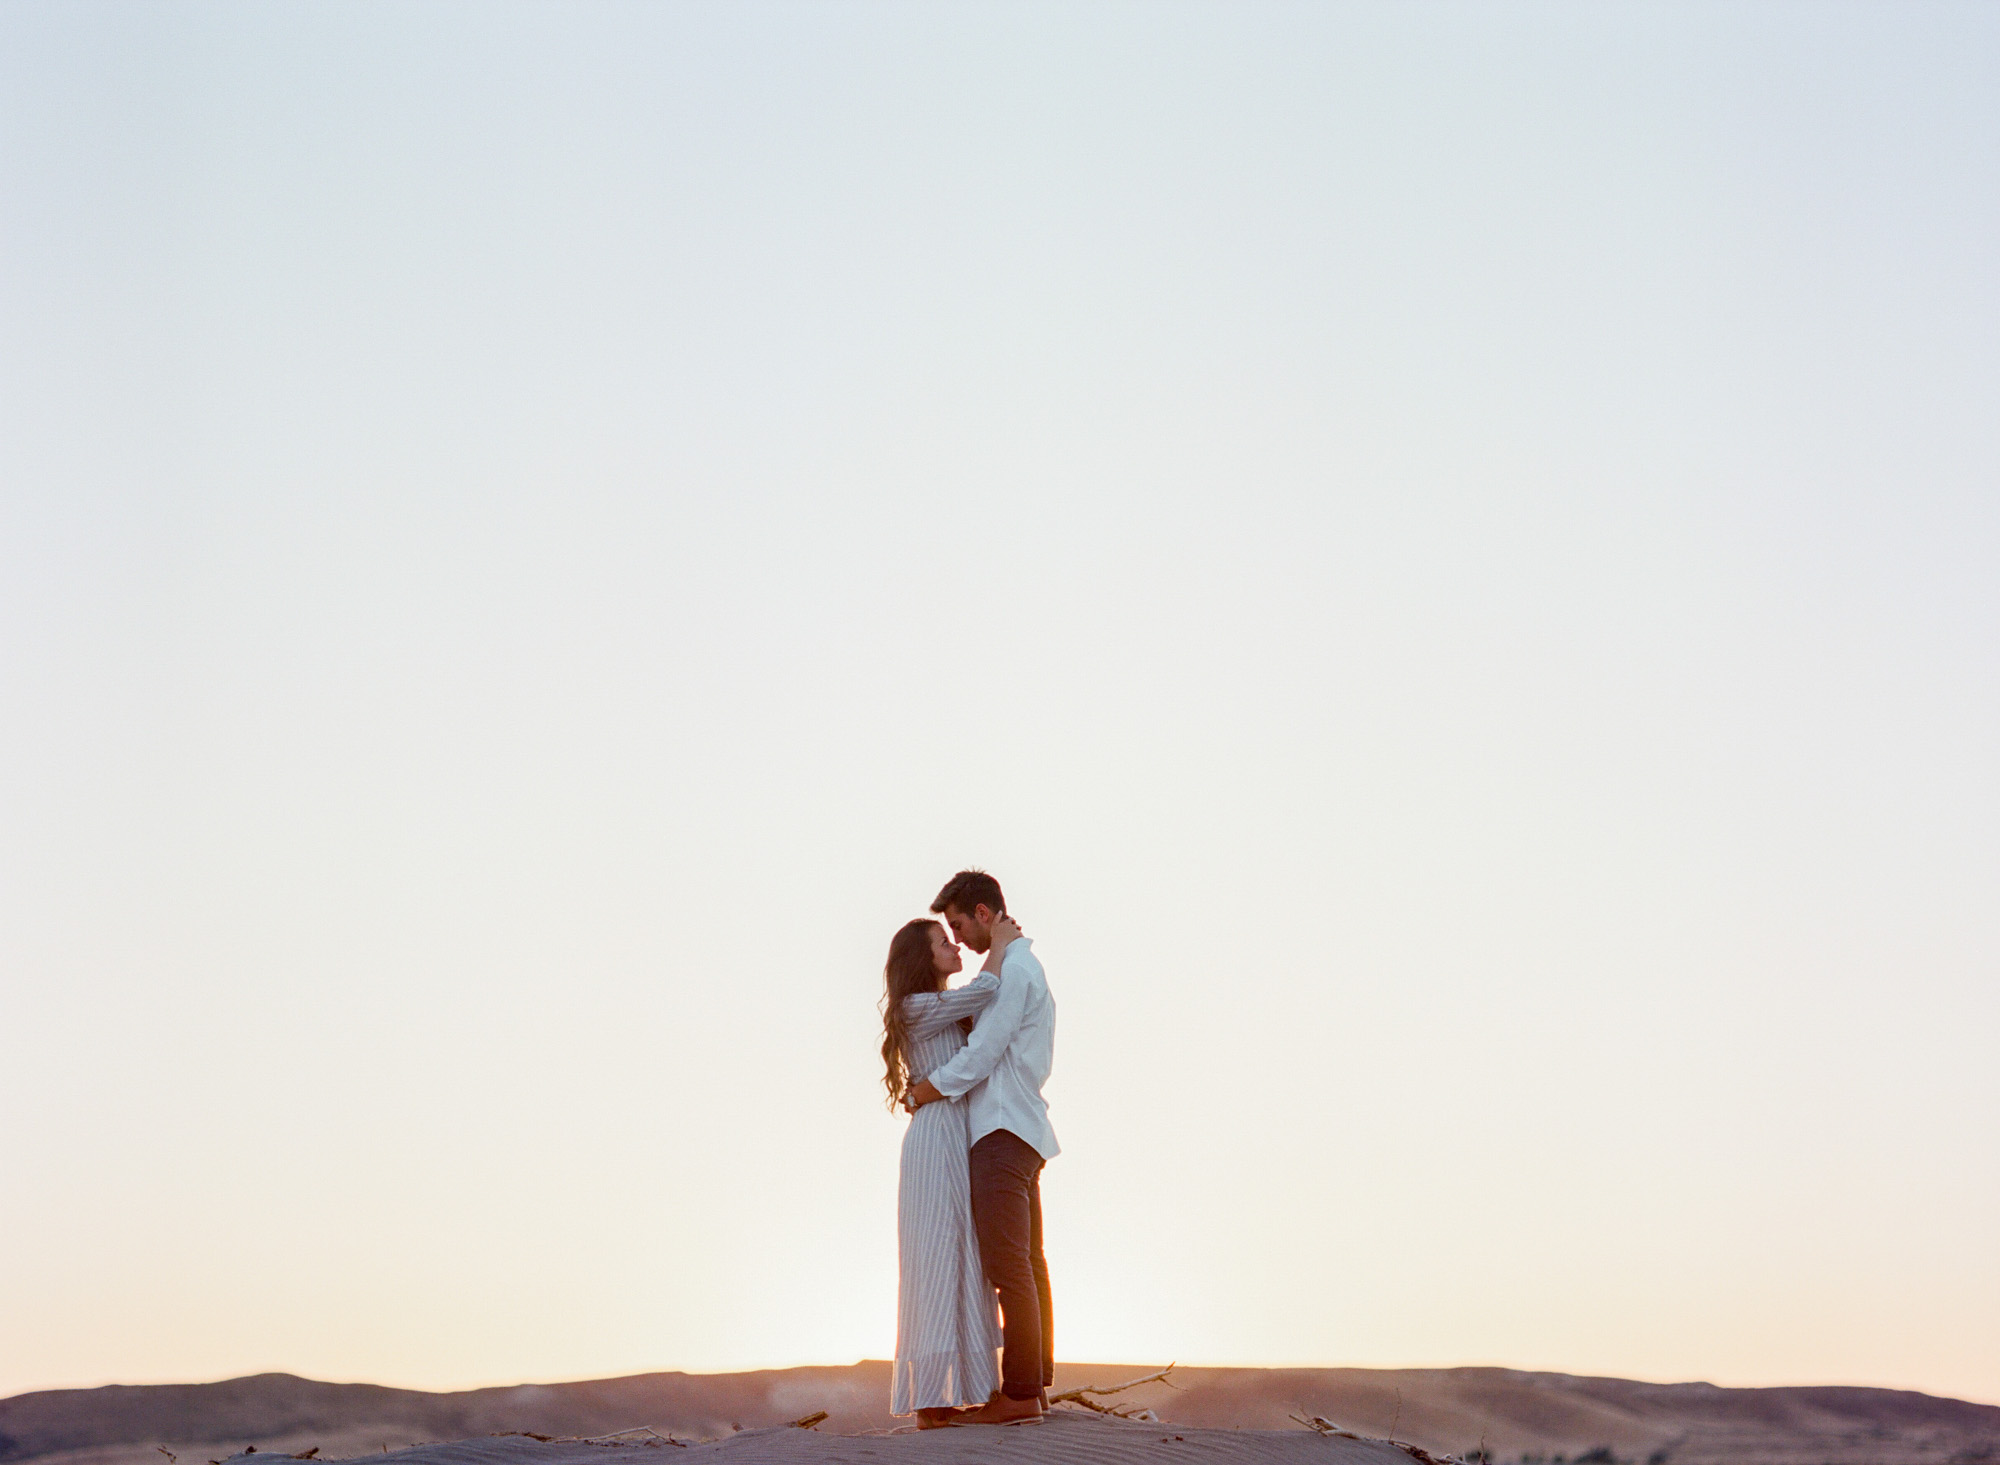 boise-idaho-film-wedding-photographer-38.jpg